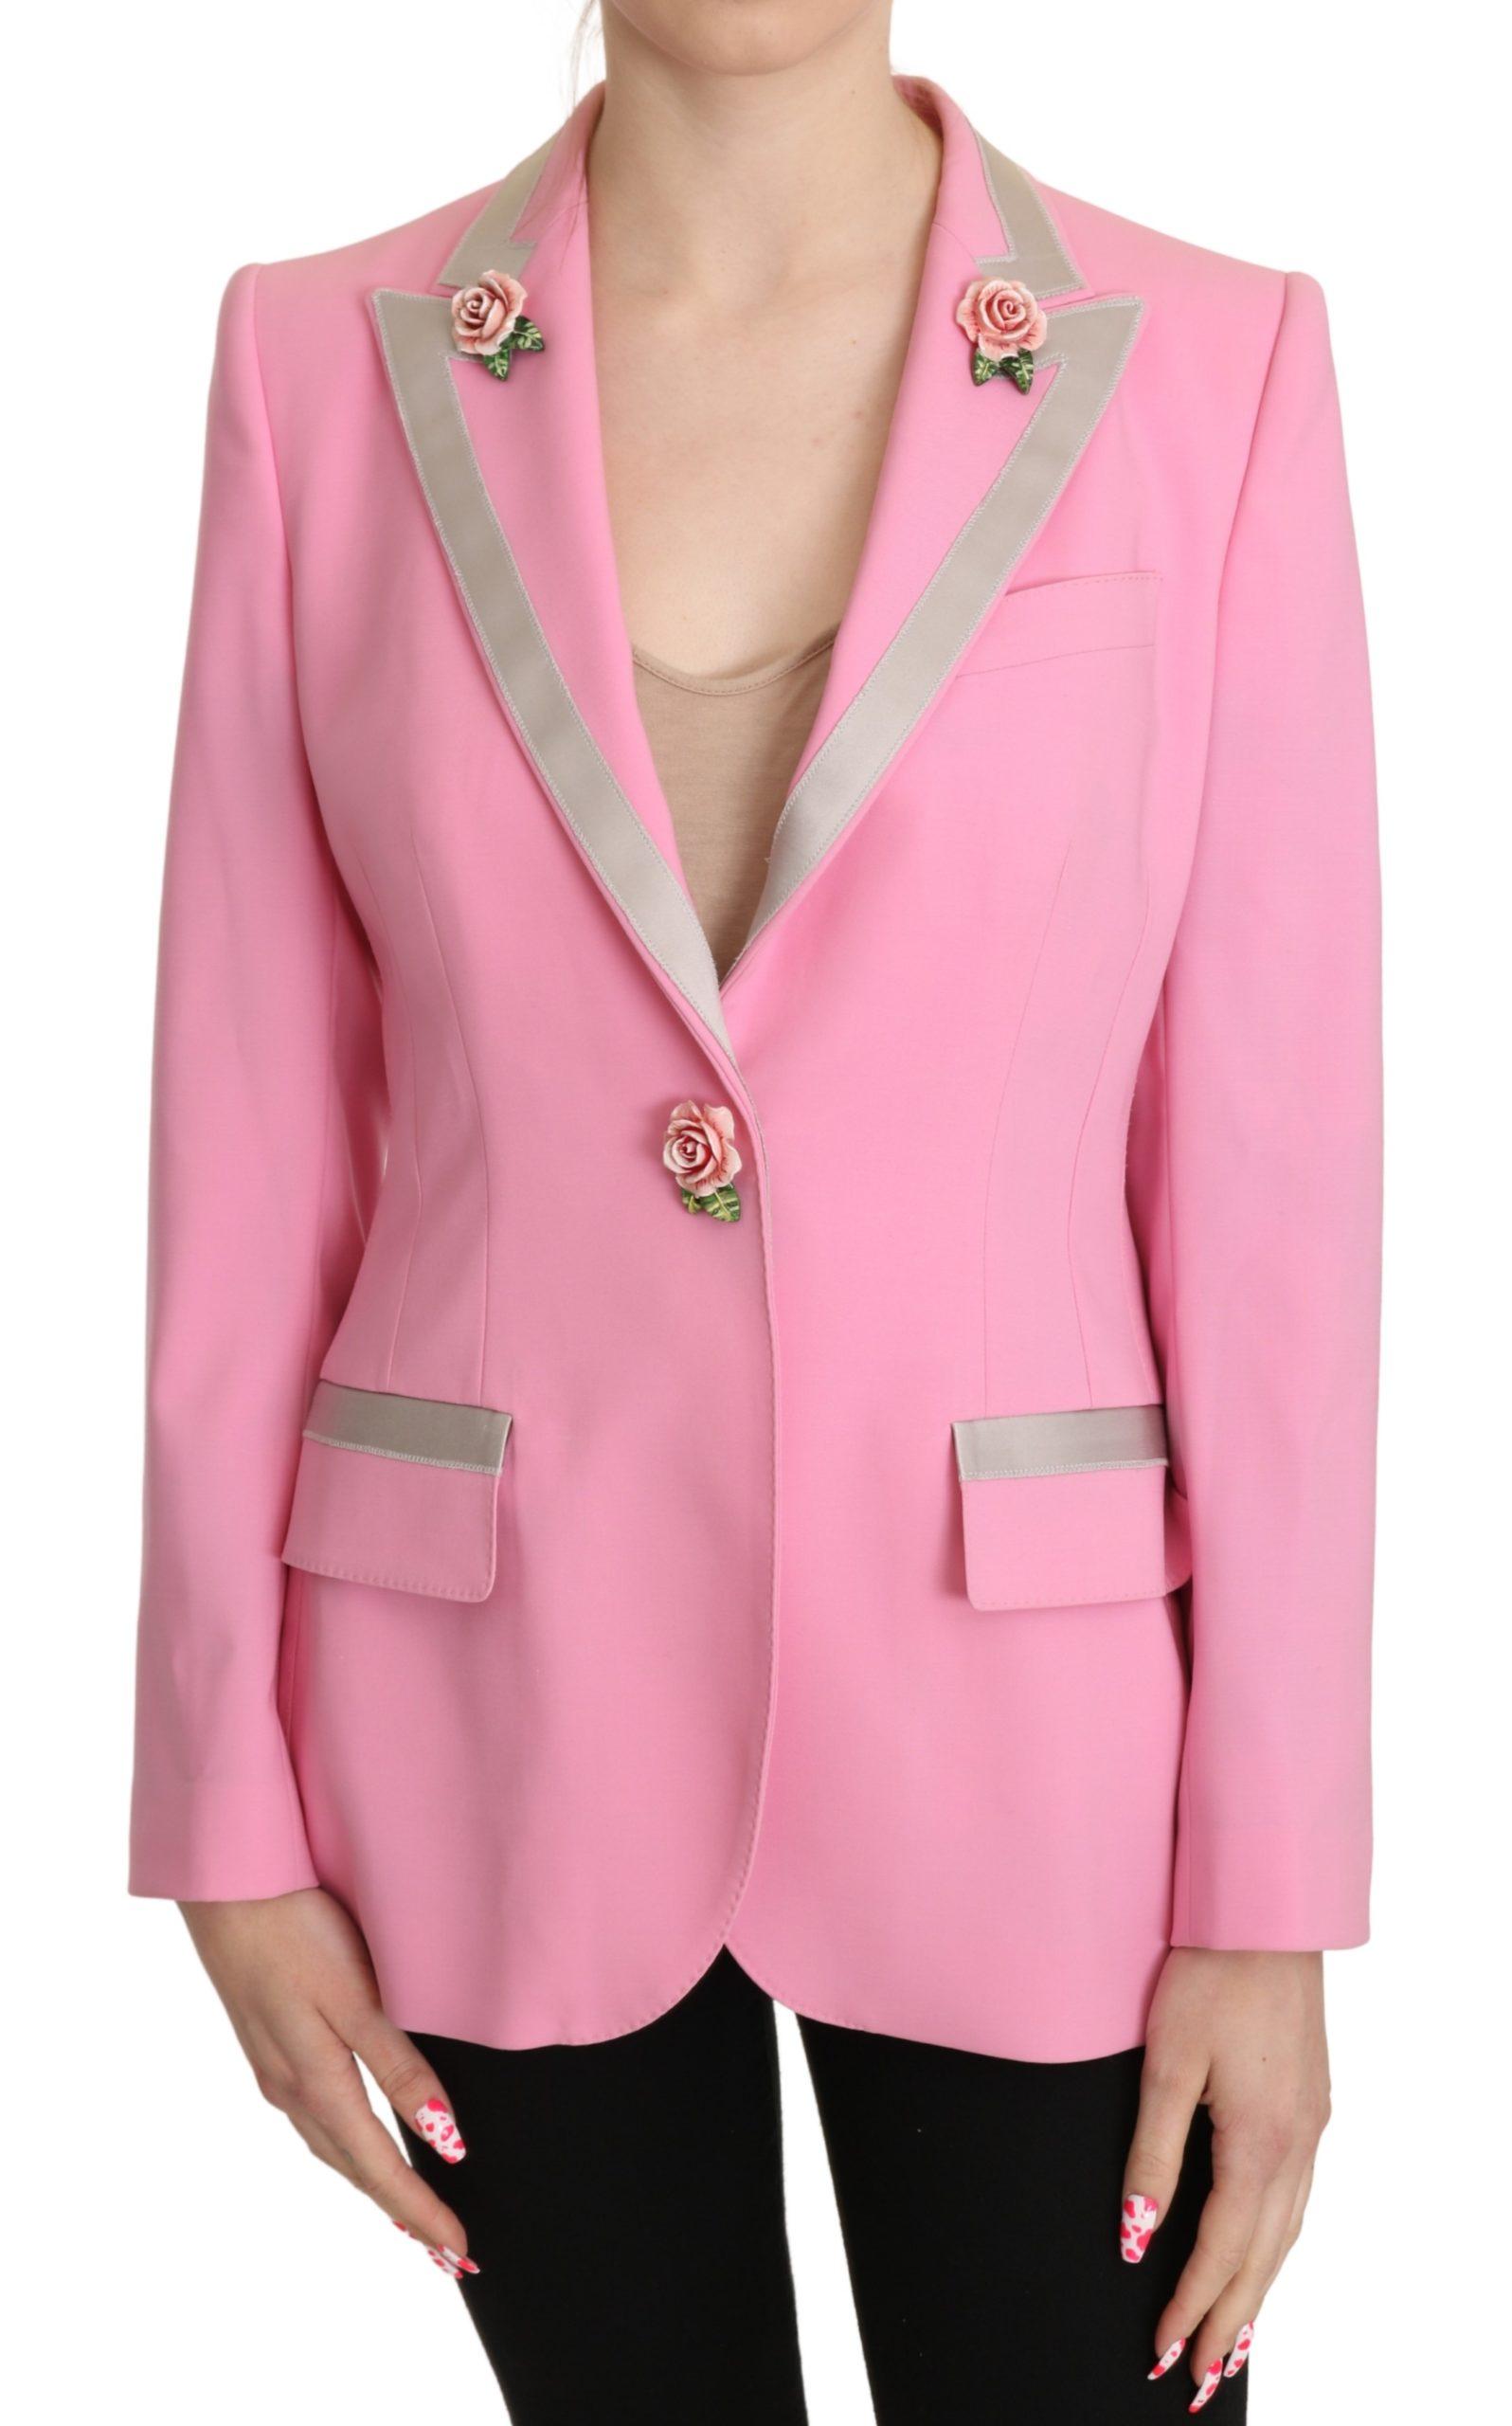 Dolce & Gabbana Women's Roses Single Breasted Jacket Pink KOS1817 - IT42|M